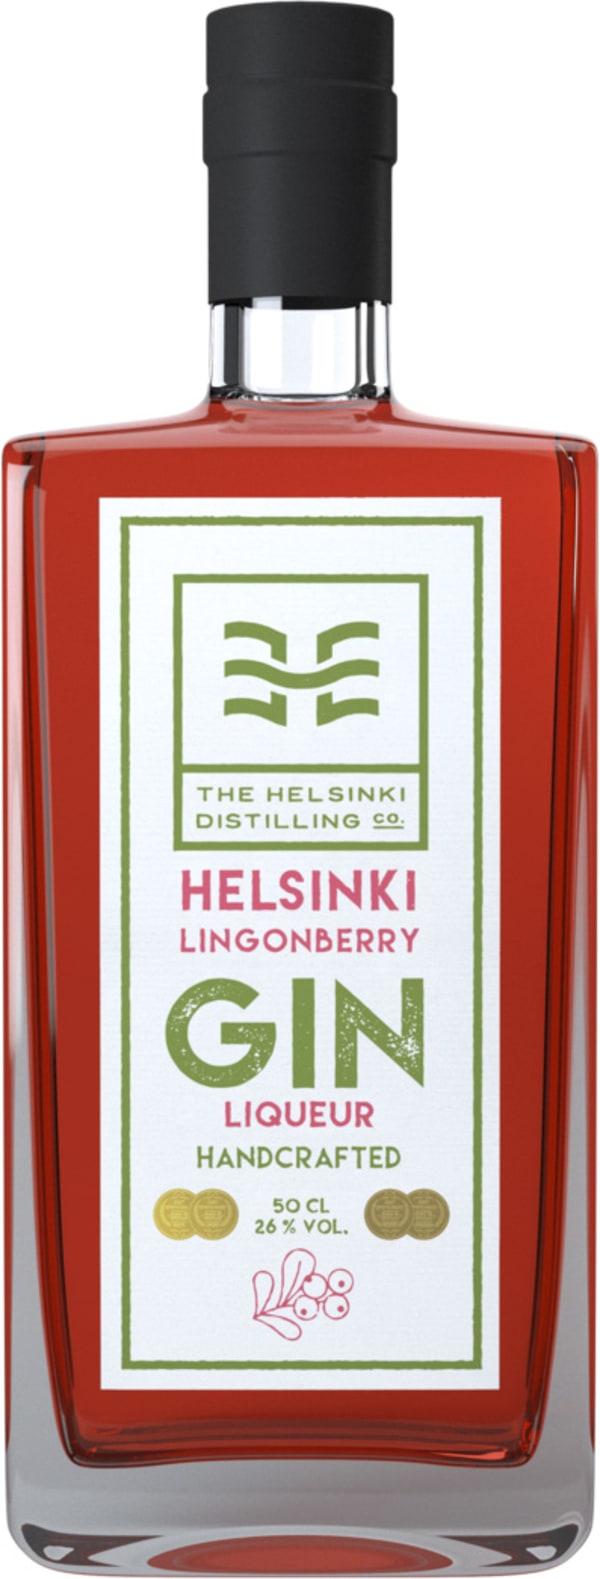 Helsinki Distilling Company Puolukka-Gin